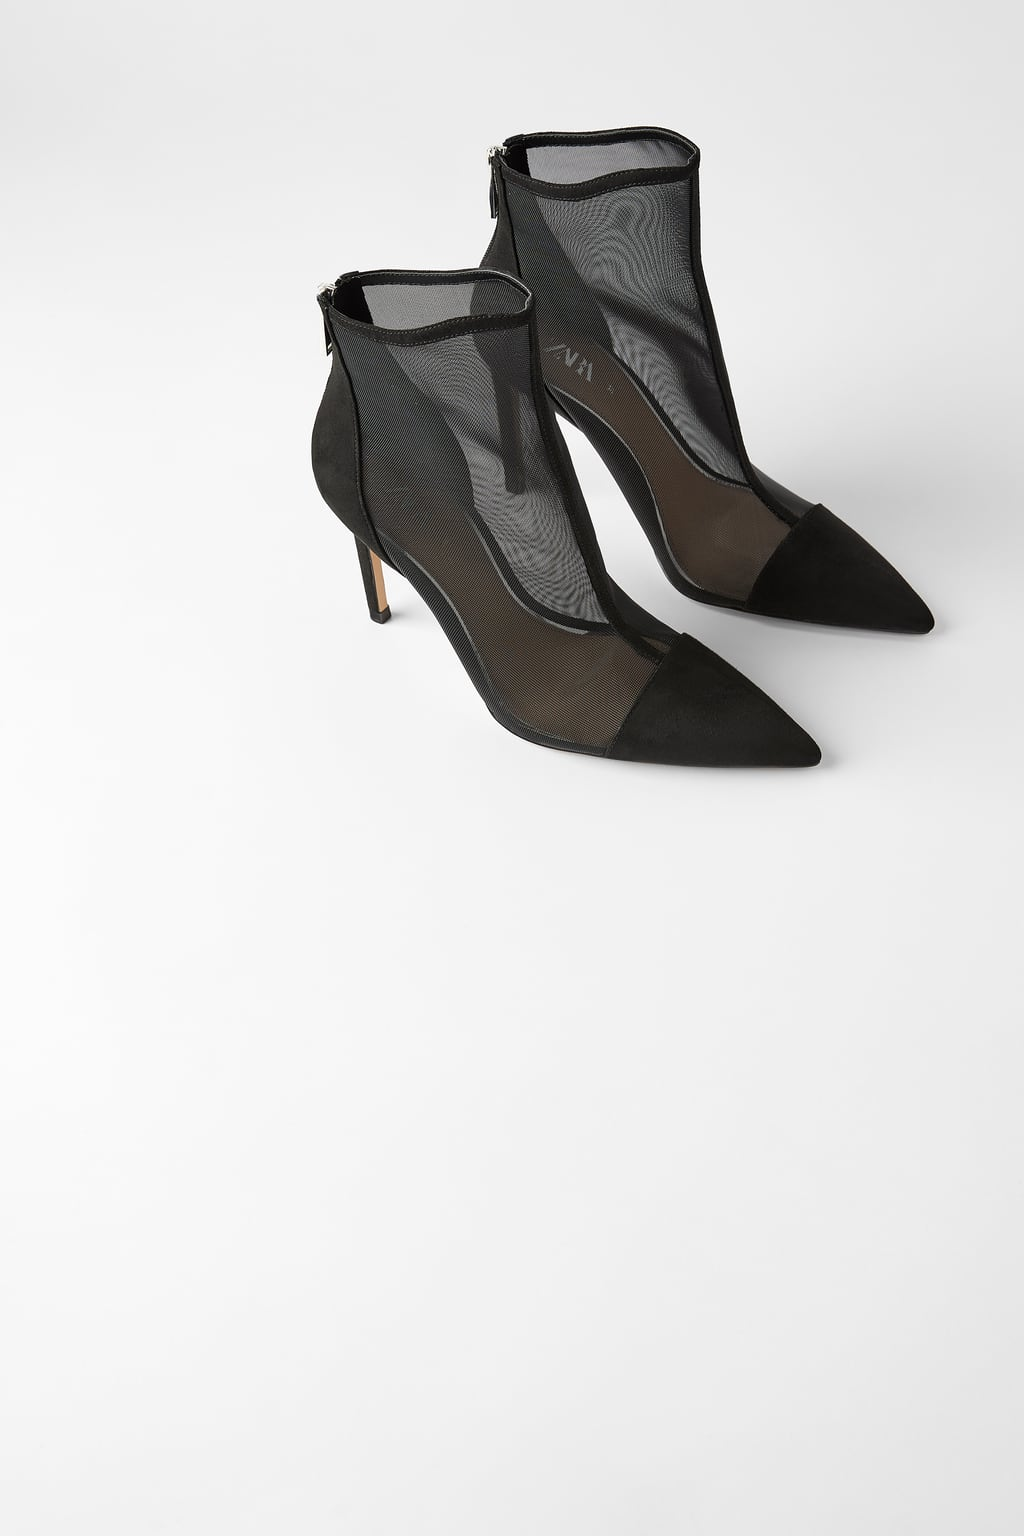 Botin Zara 2019